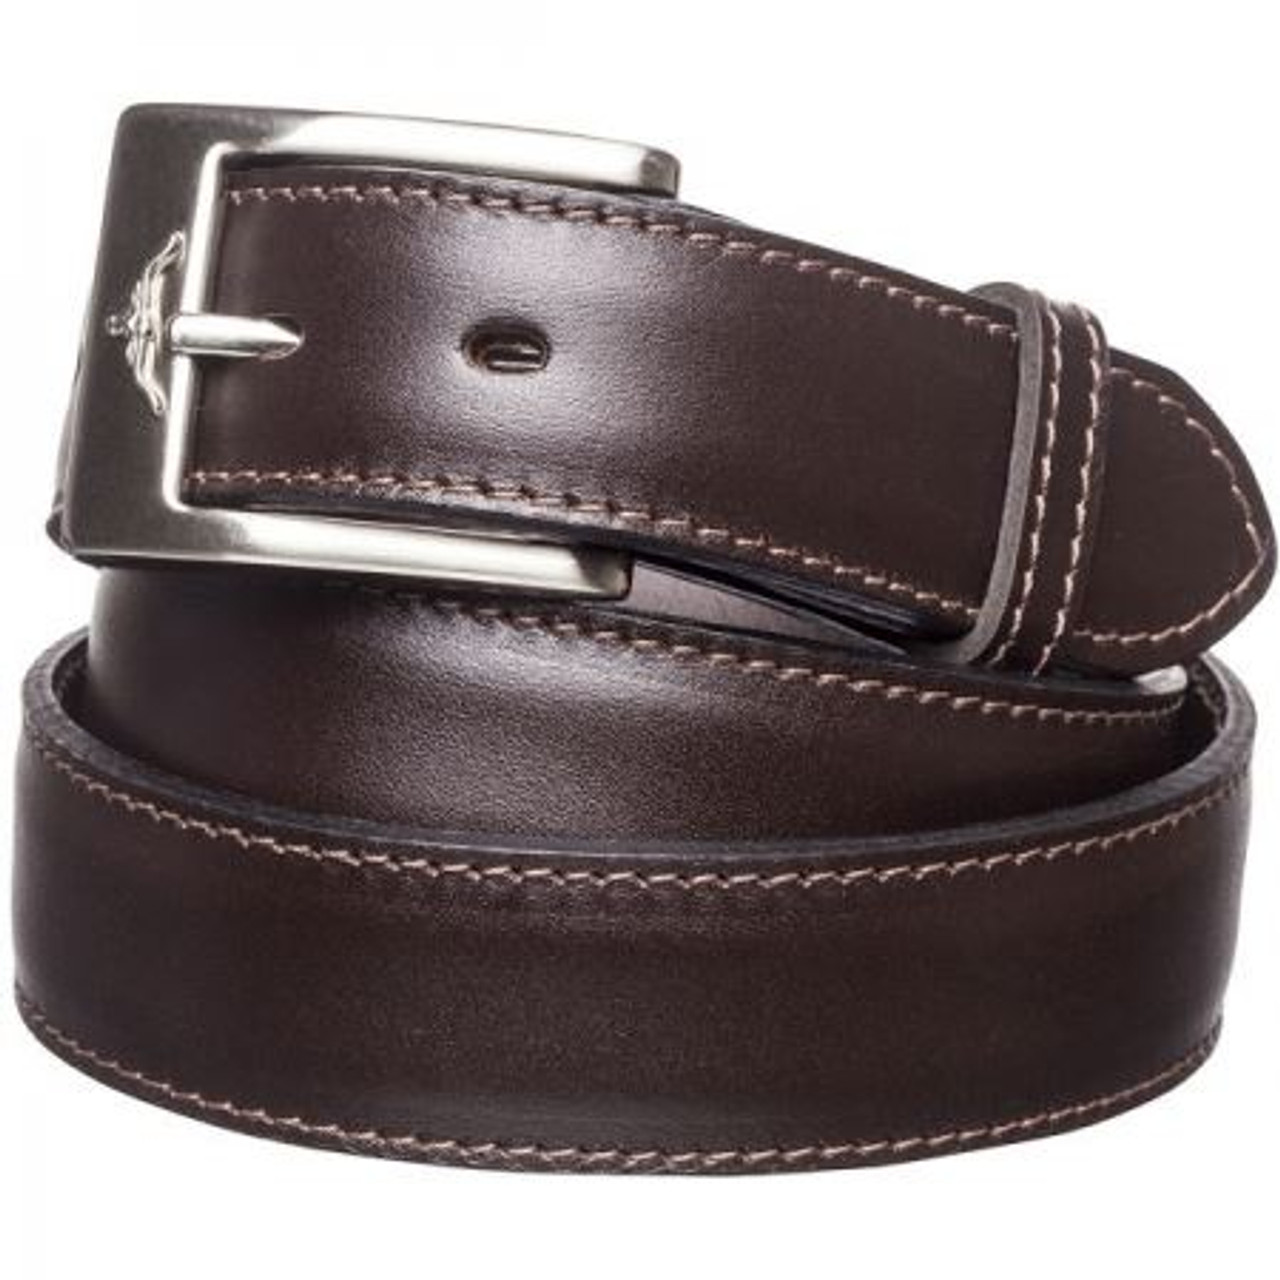 R.M. Williams Mens 1.25 Inch Dress Belt